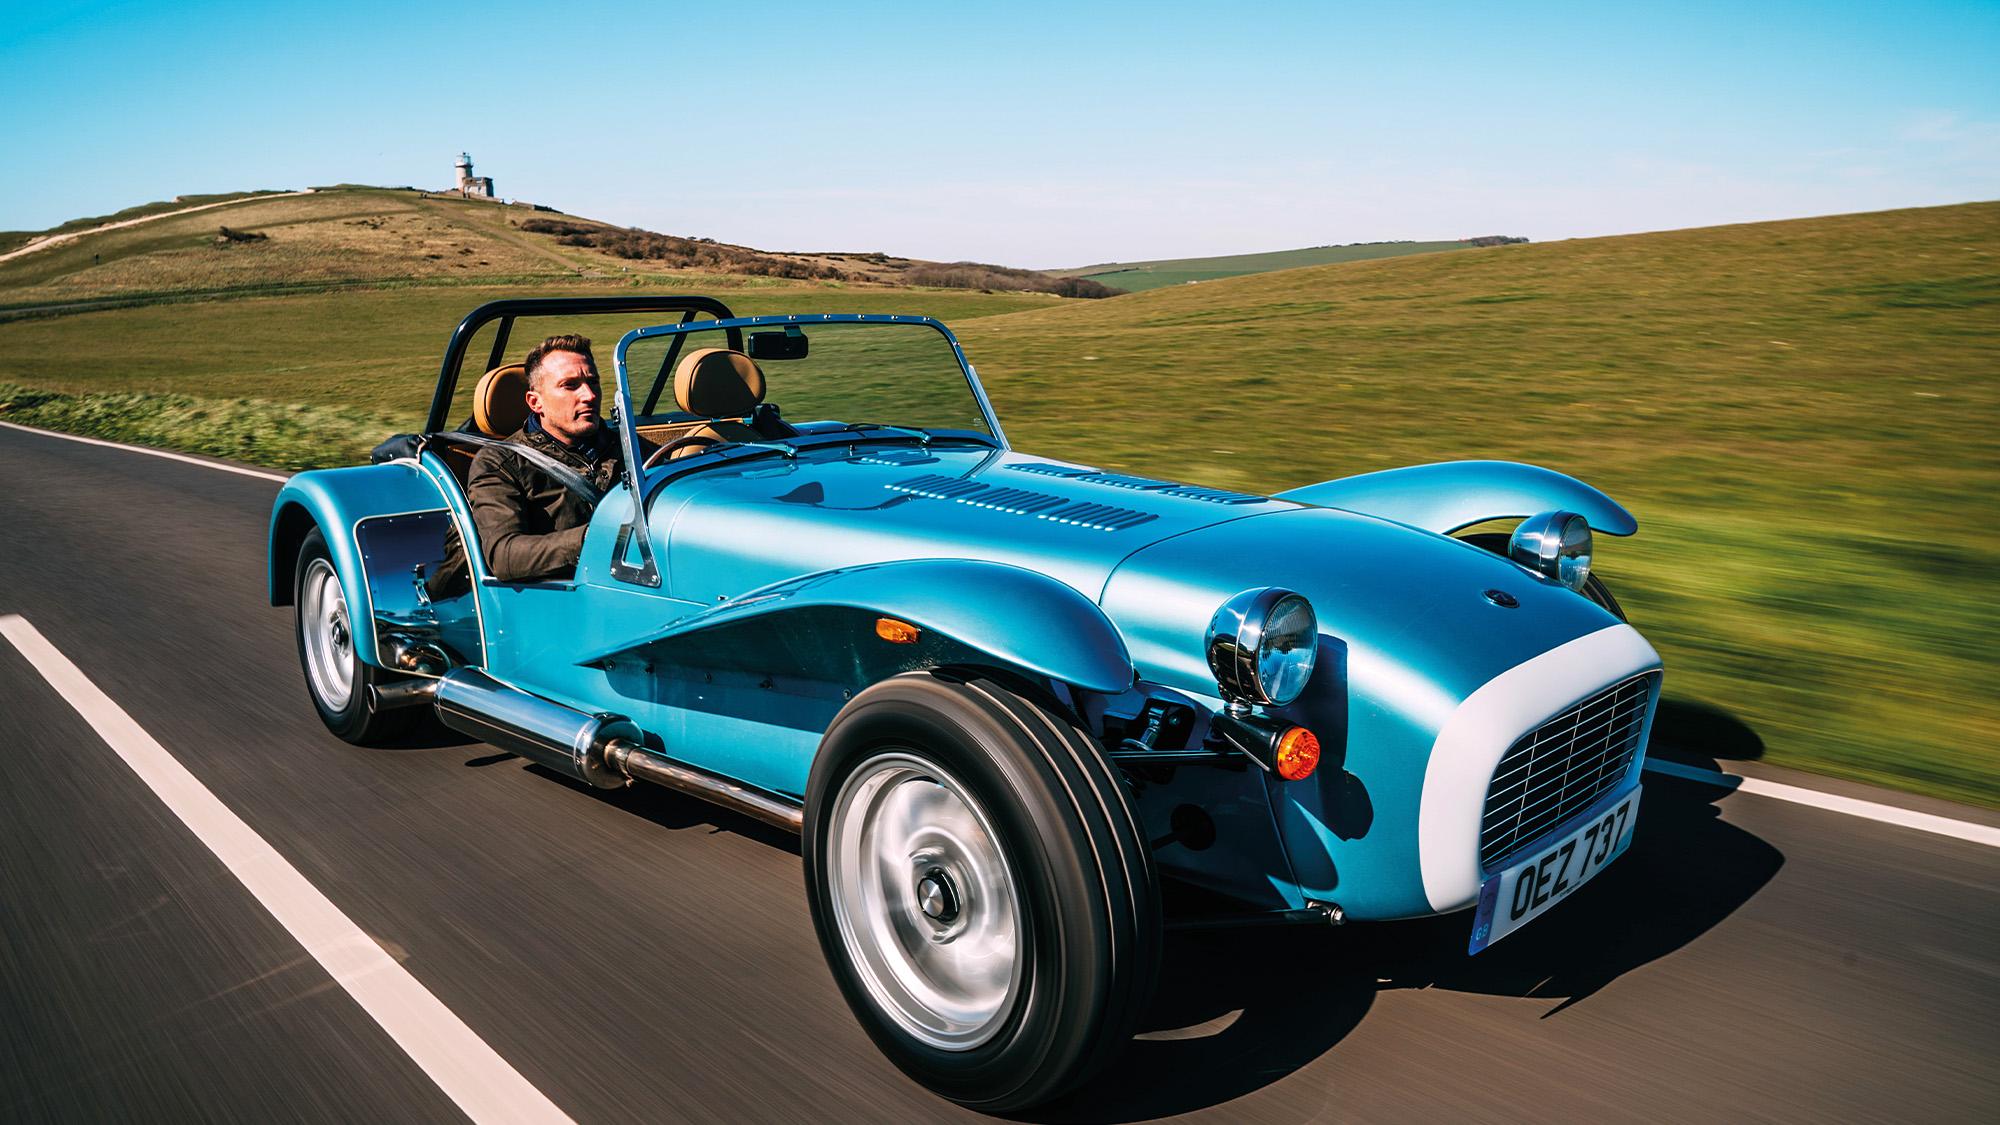 Caterham Super Seven on the road